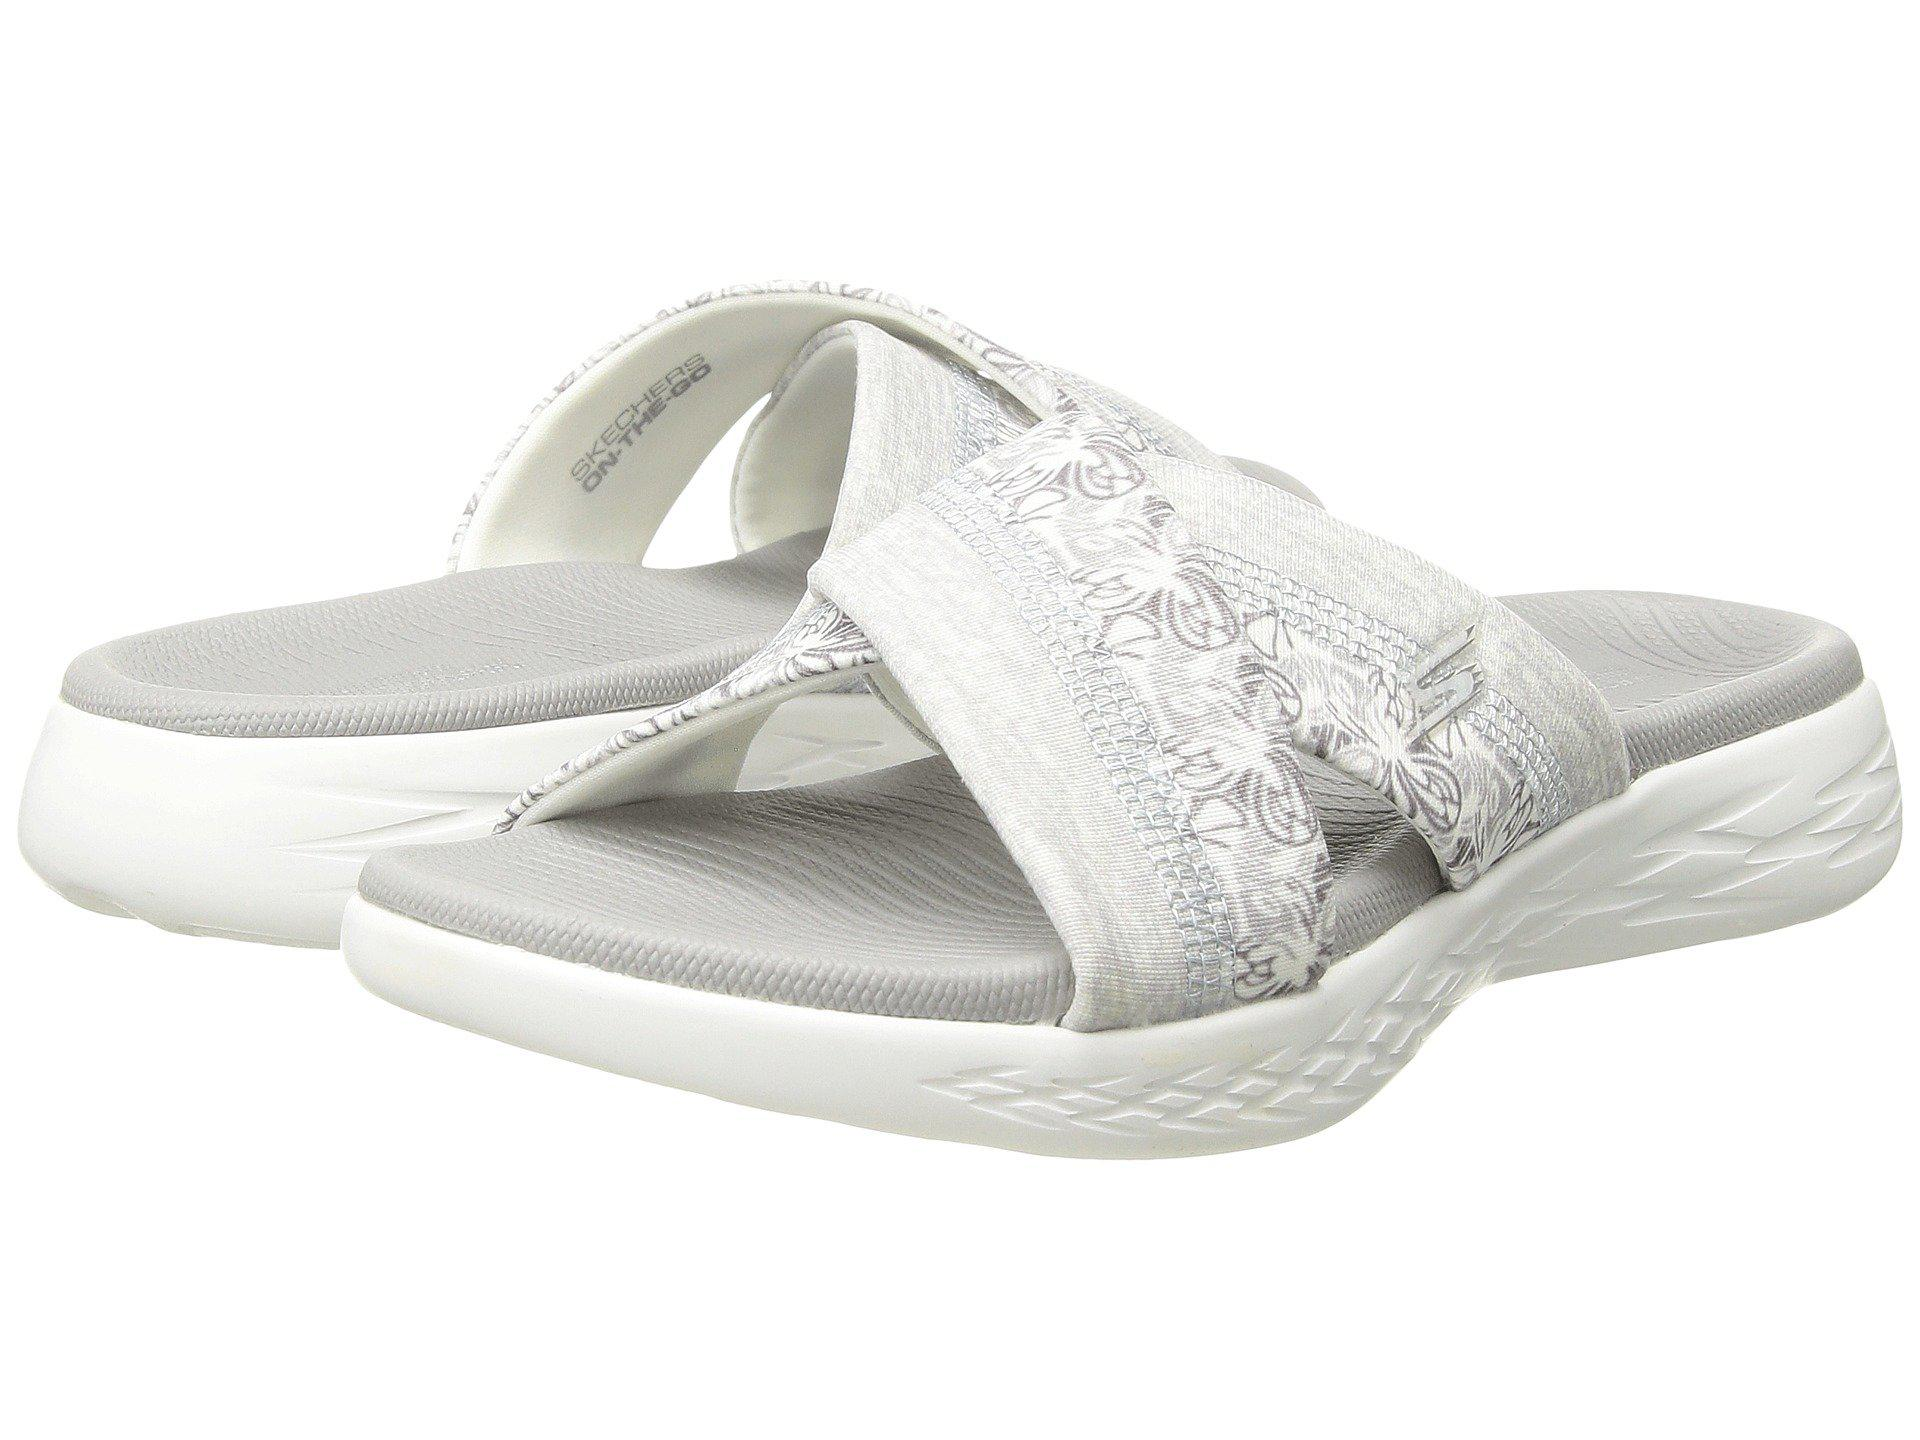 1a3c883f672c Skechers - White On-the-go 600 - Monarch (black) Women s Sandals. View  fullscreen